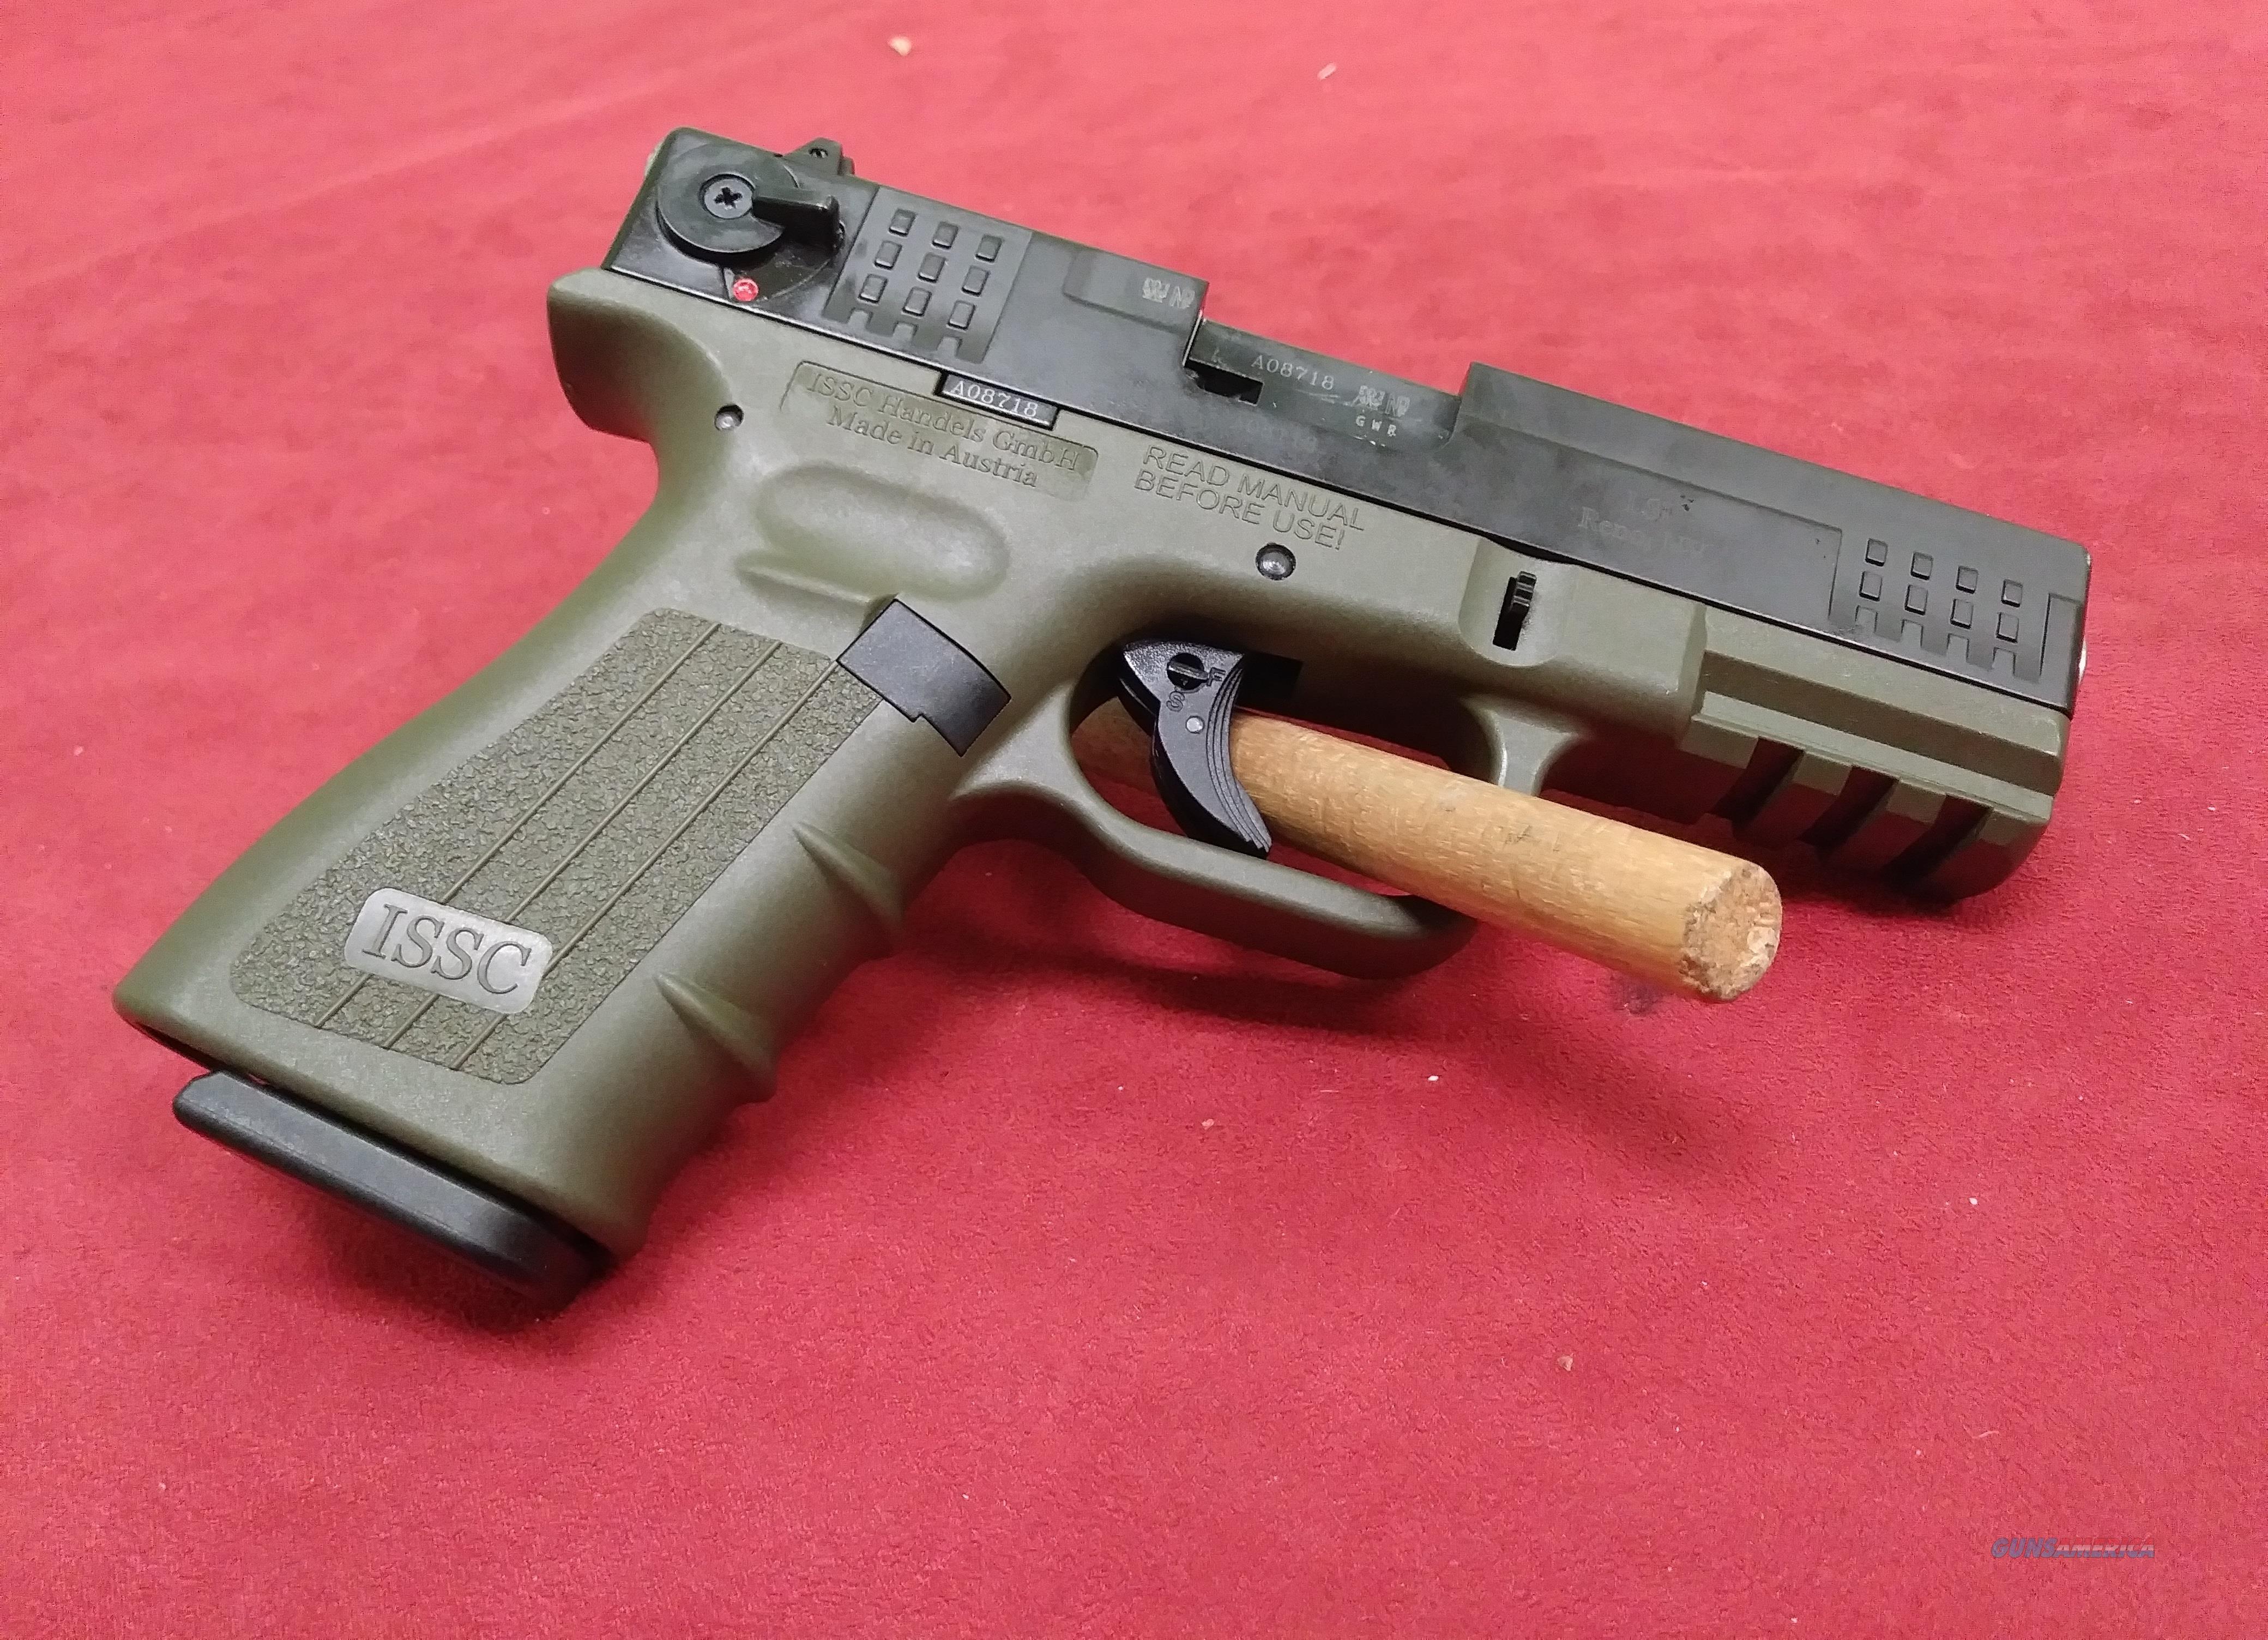 ISSC/LSI M22, .22LR  Guns > Pistols > ISSC Pistols